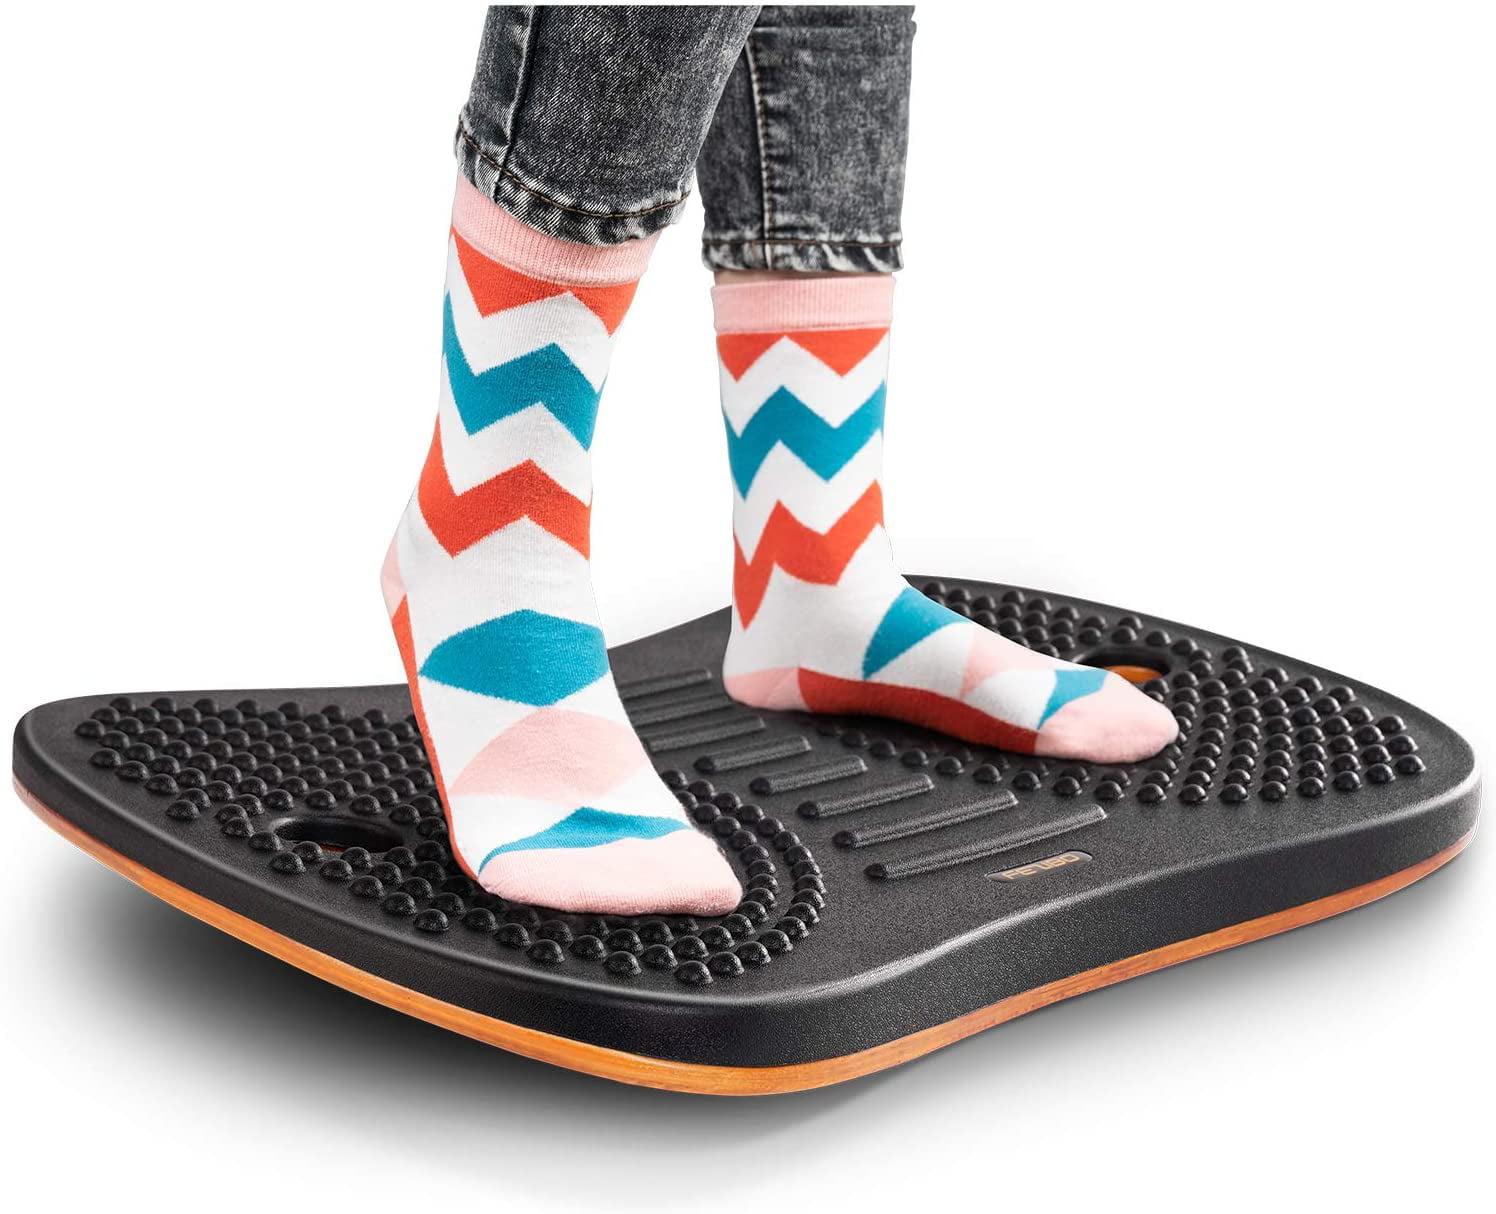 Standing Desk Anti Fatigue Mat FEZIBO Wooden Wobble Balance Board Stability Rocker with Ergonomic Design Comfort Floor Mat